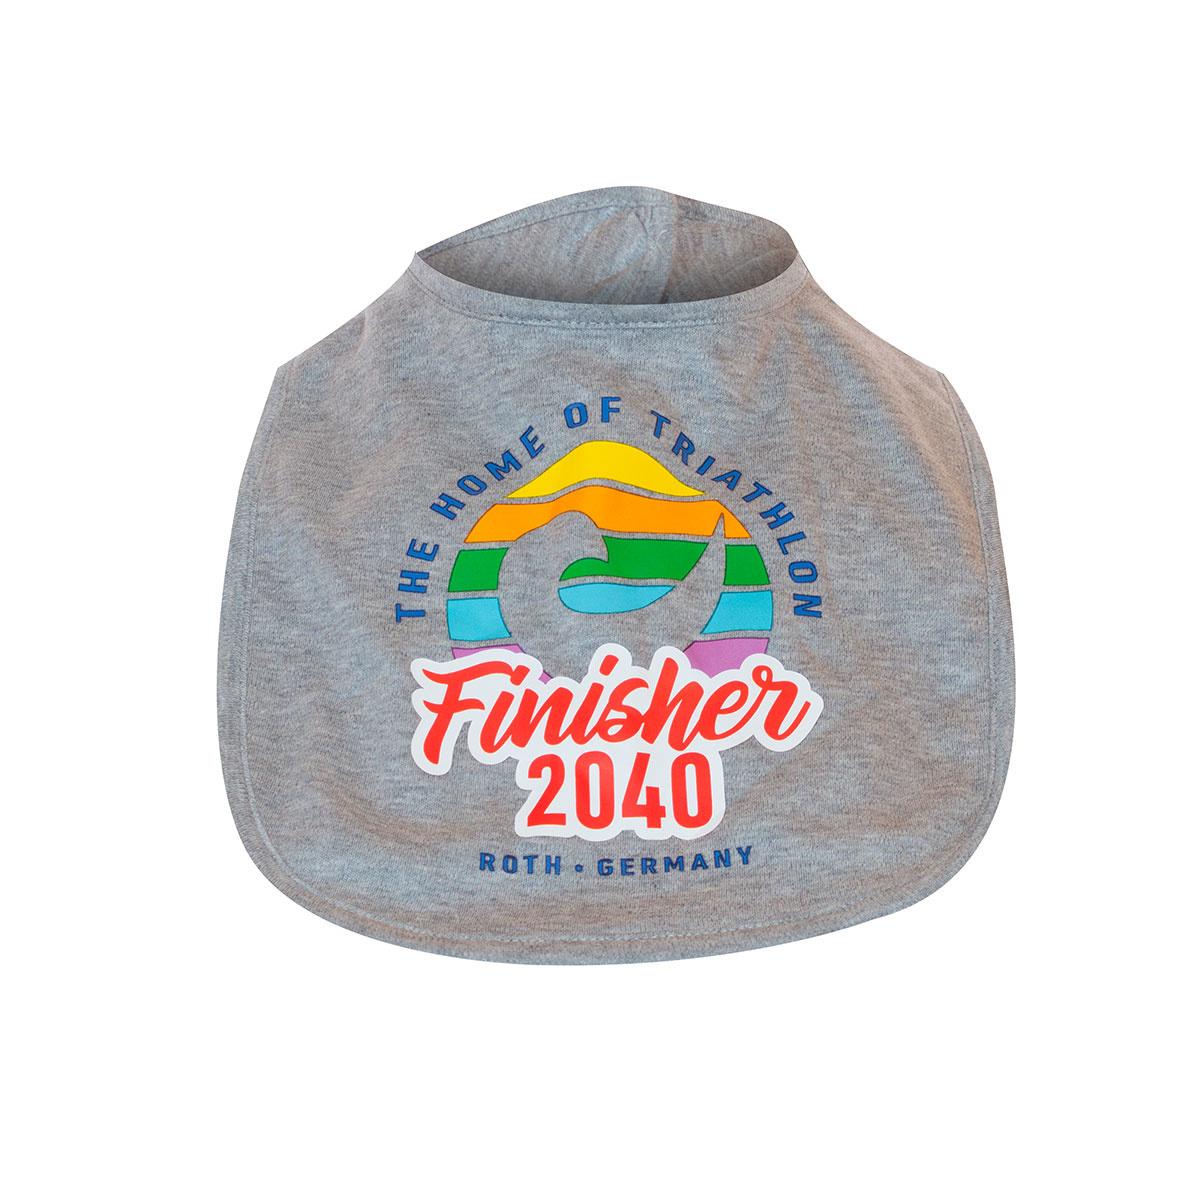 Babybib Finisher 2040-1